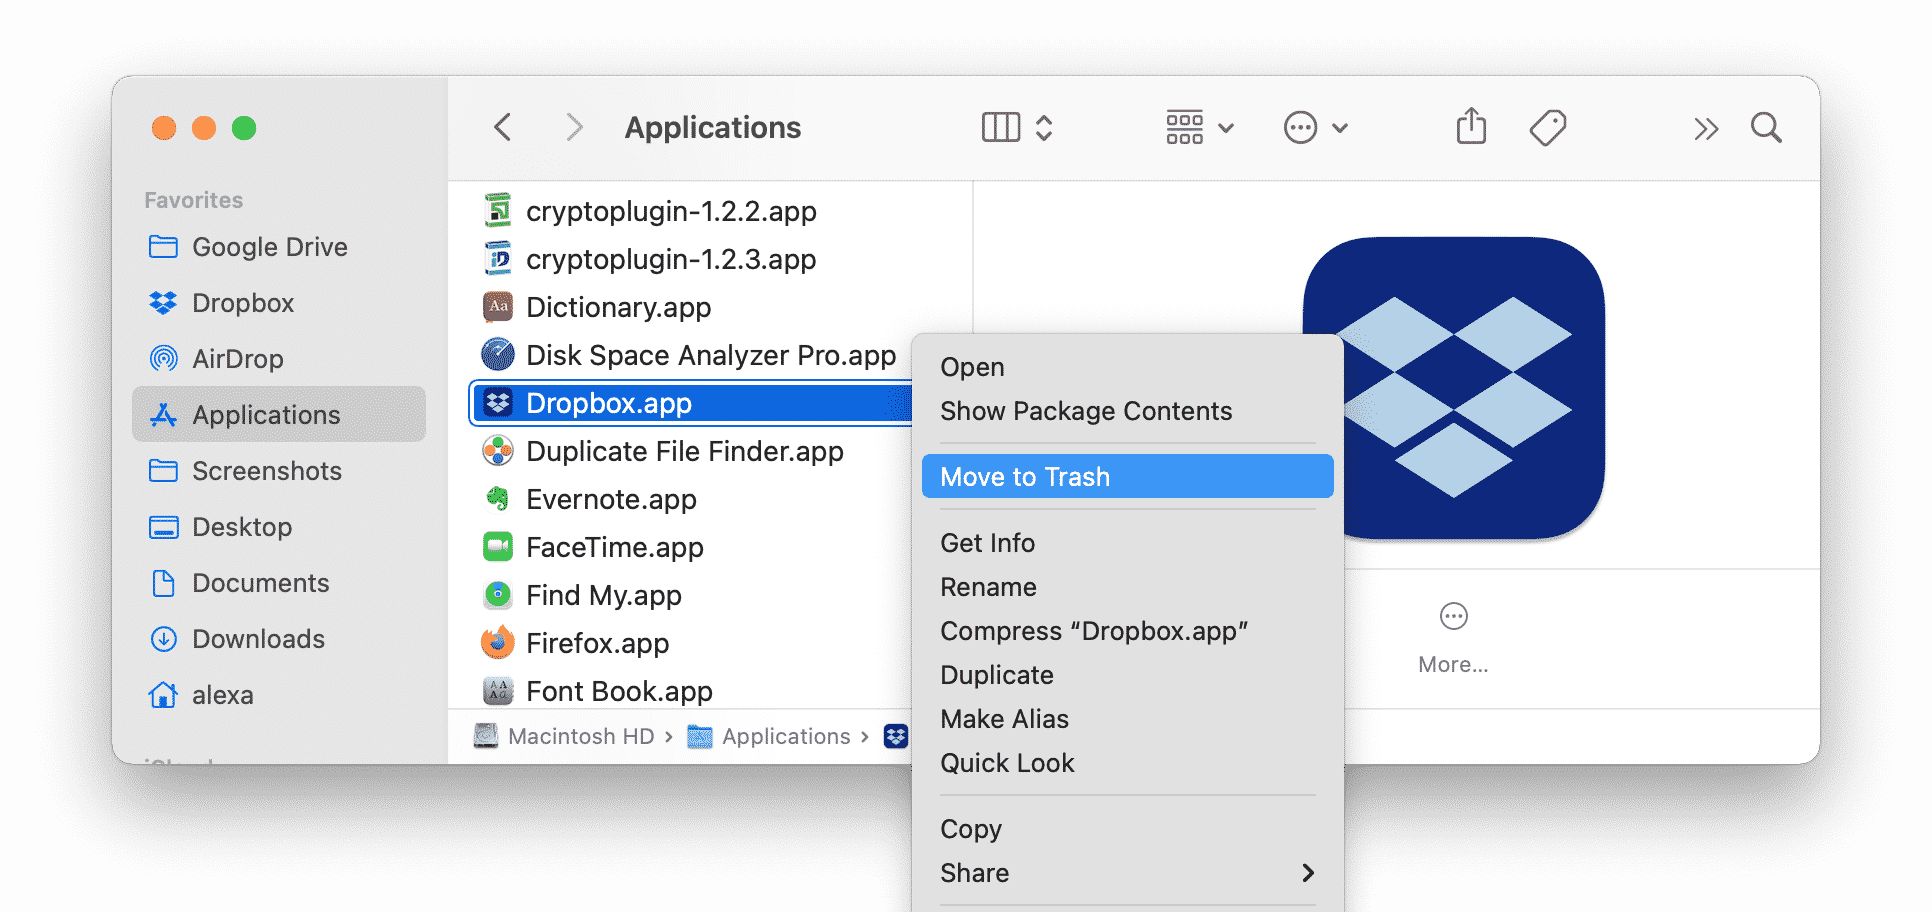 Applications folder showing the Dropbox desktop app